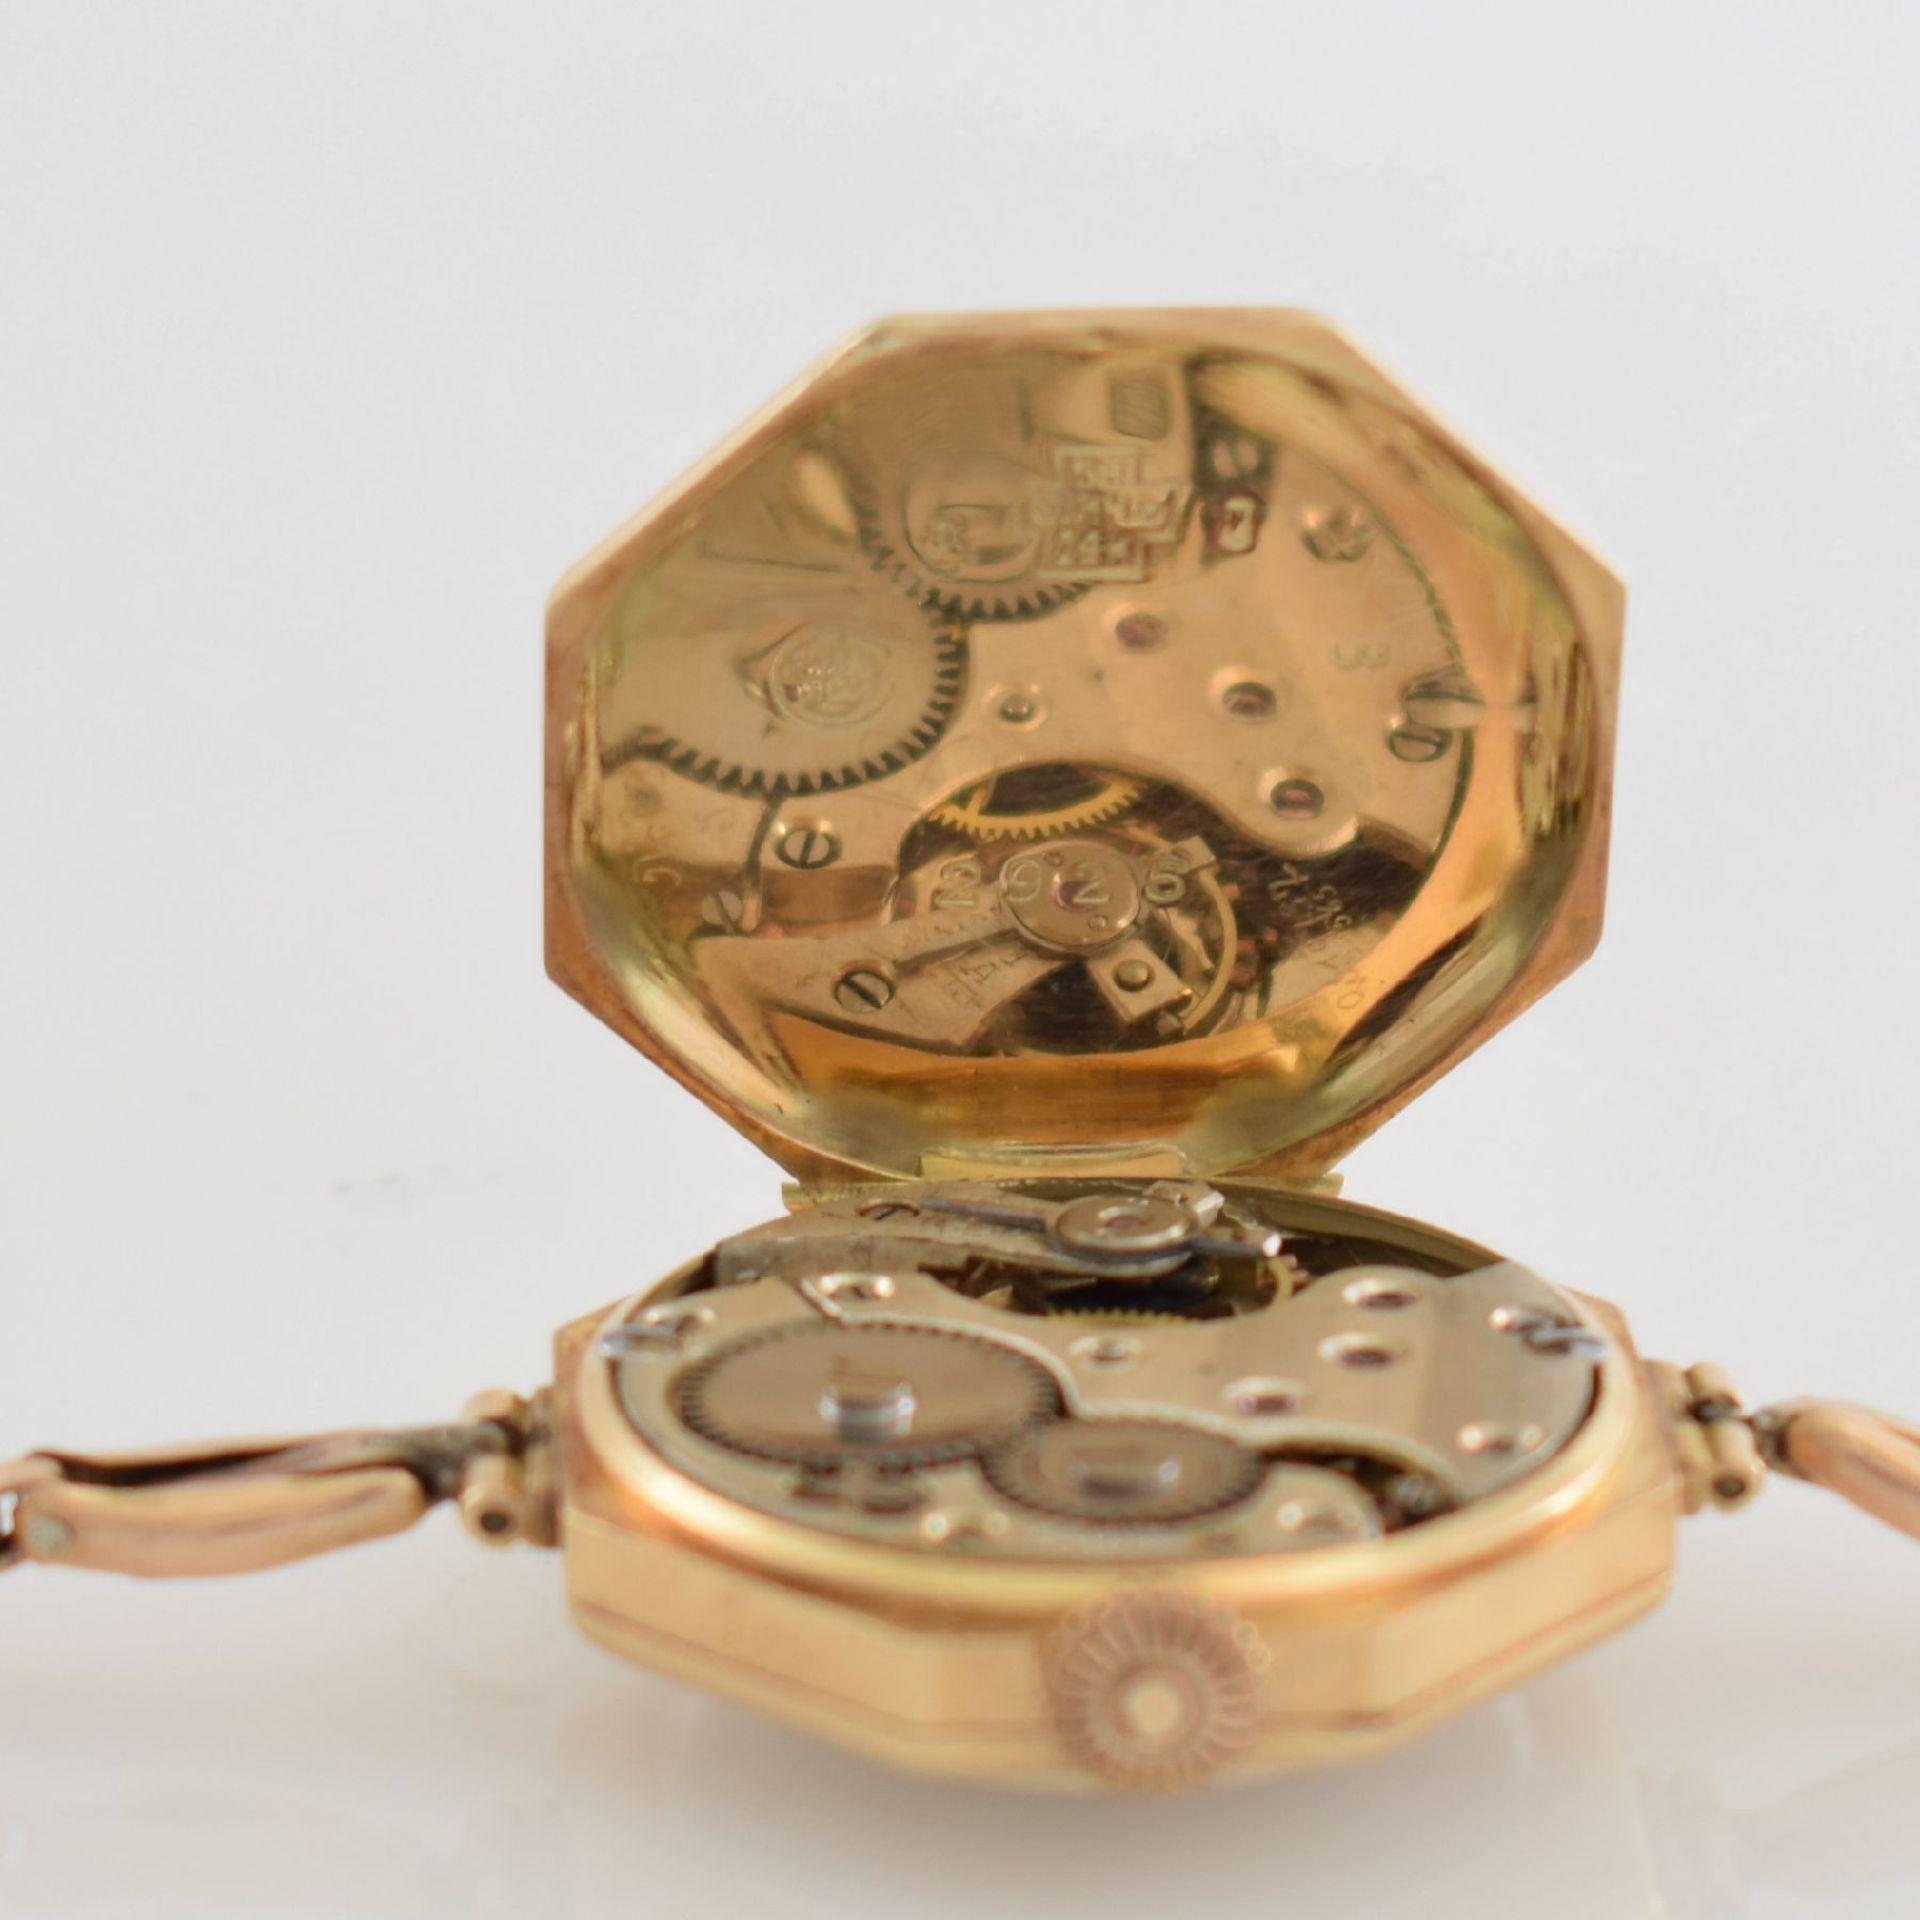 Frühe oktogonale Damenarmbanduhr in RoseG 585/000, Schweiz um 1925, Handaufzug, gedr. - Bild 3 aus 4